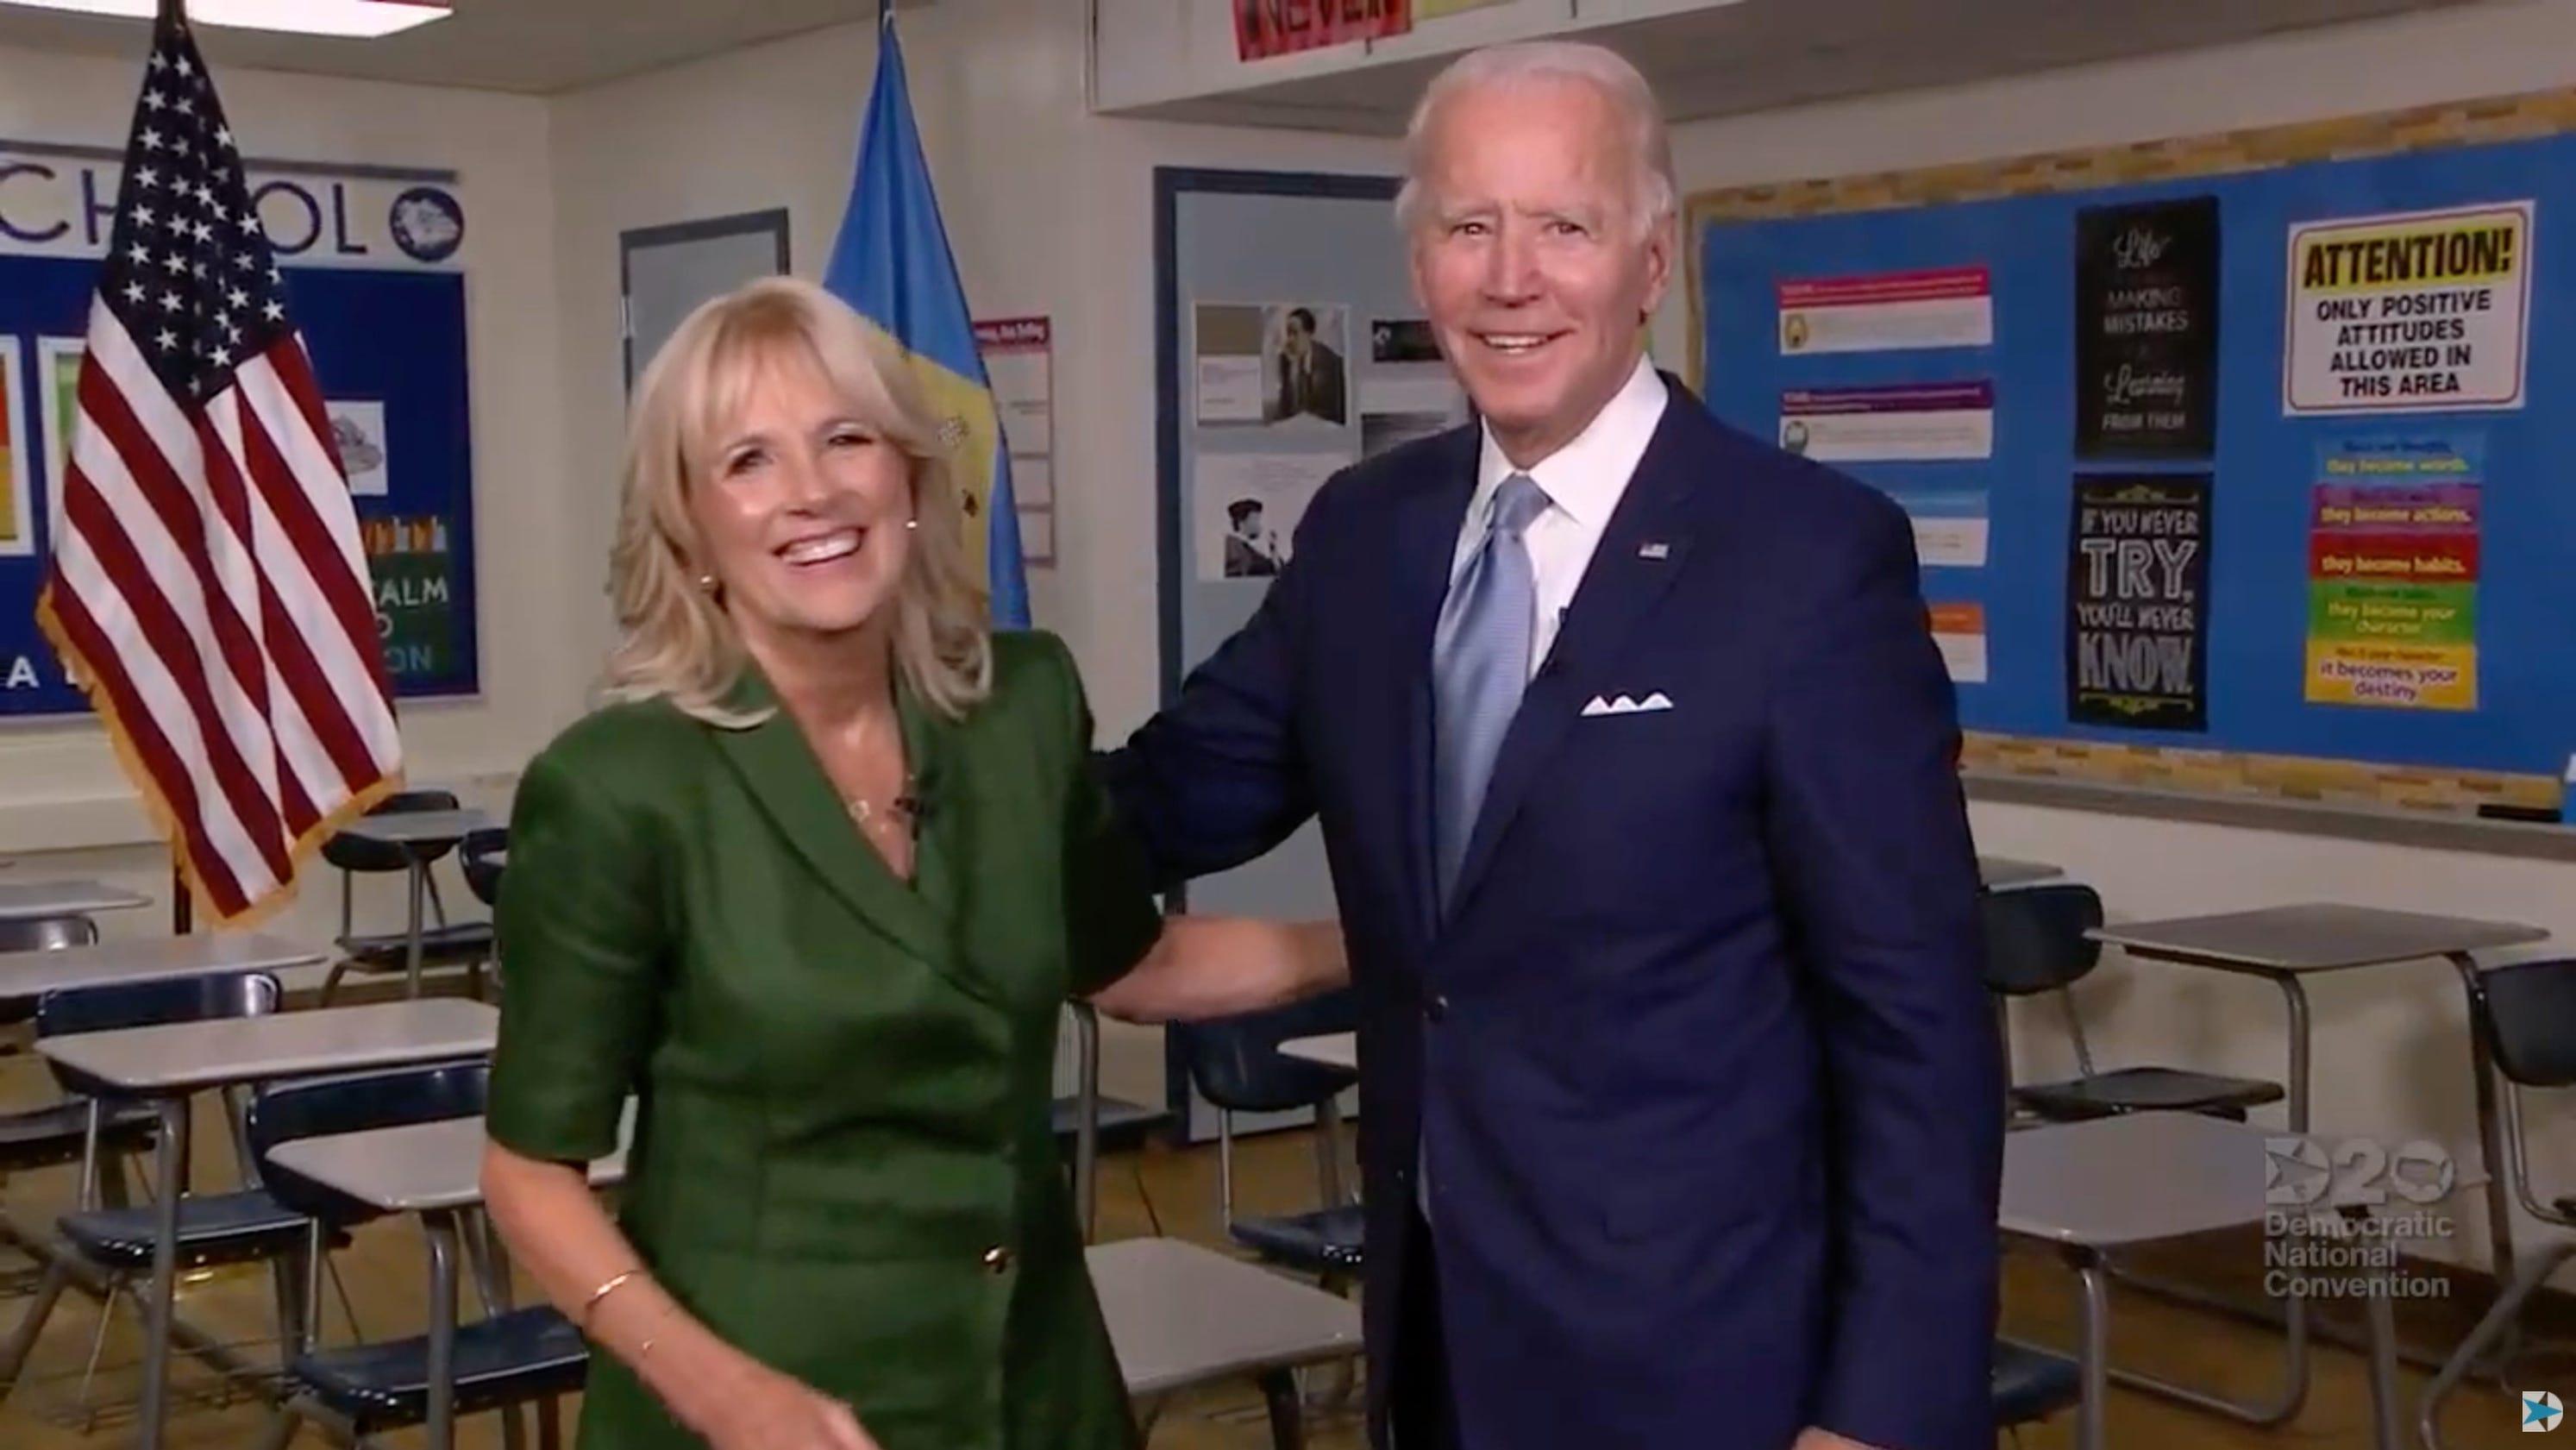 Dnc Top Moments Jill Biden Shares Intimate Portrayal Of Joe Biden Bill Clinton Hits Trump